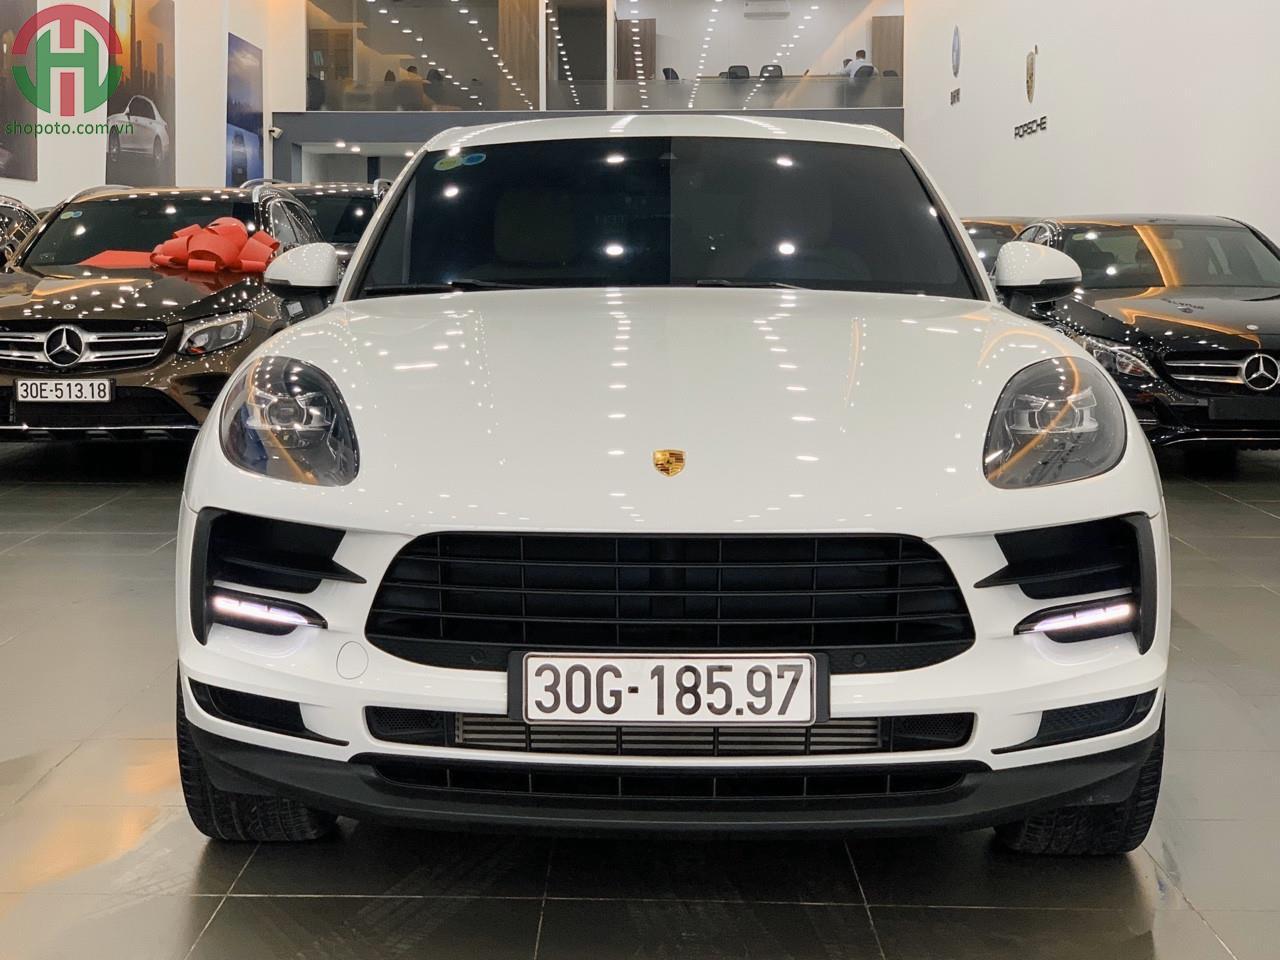 Porsche Macan model 2020